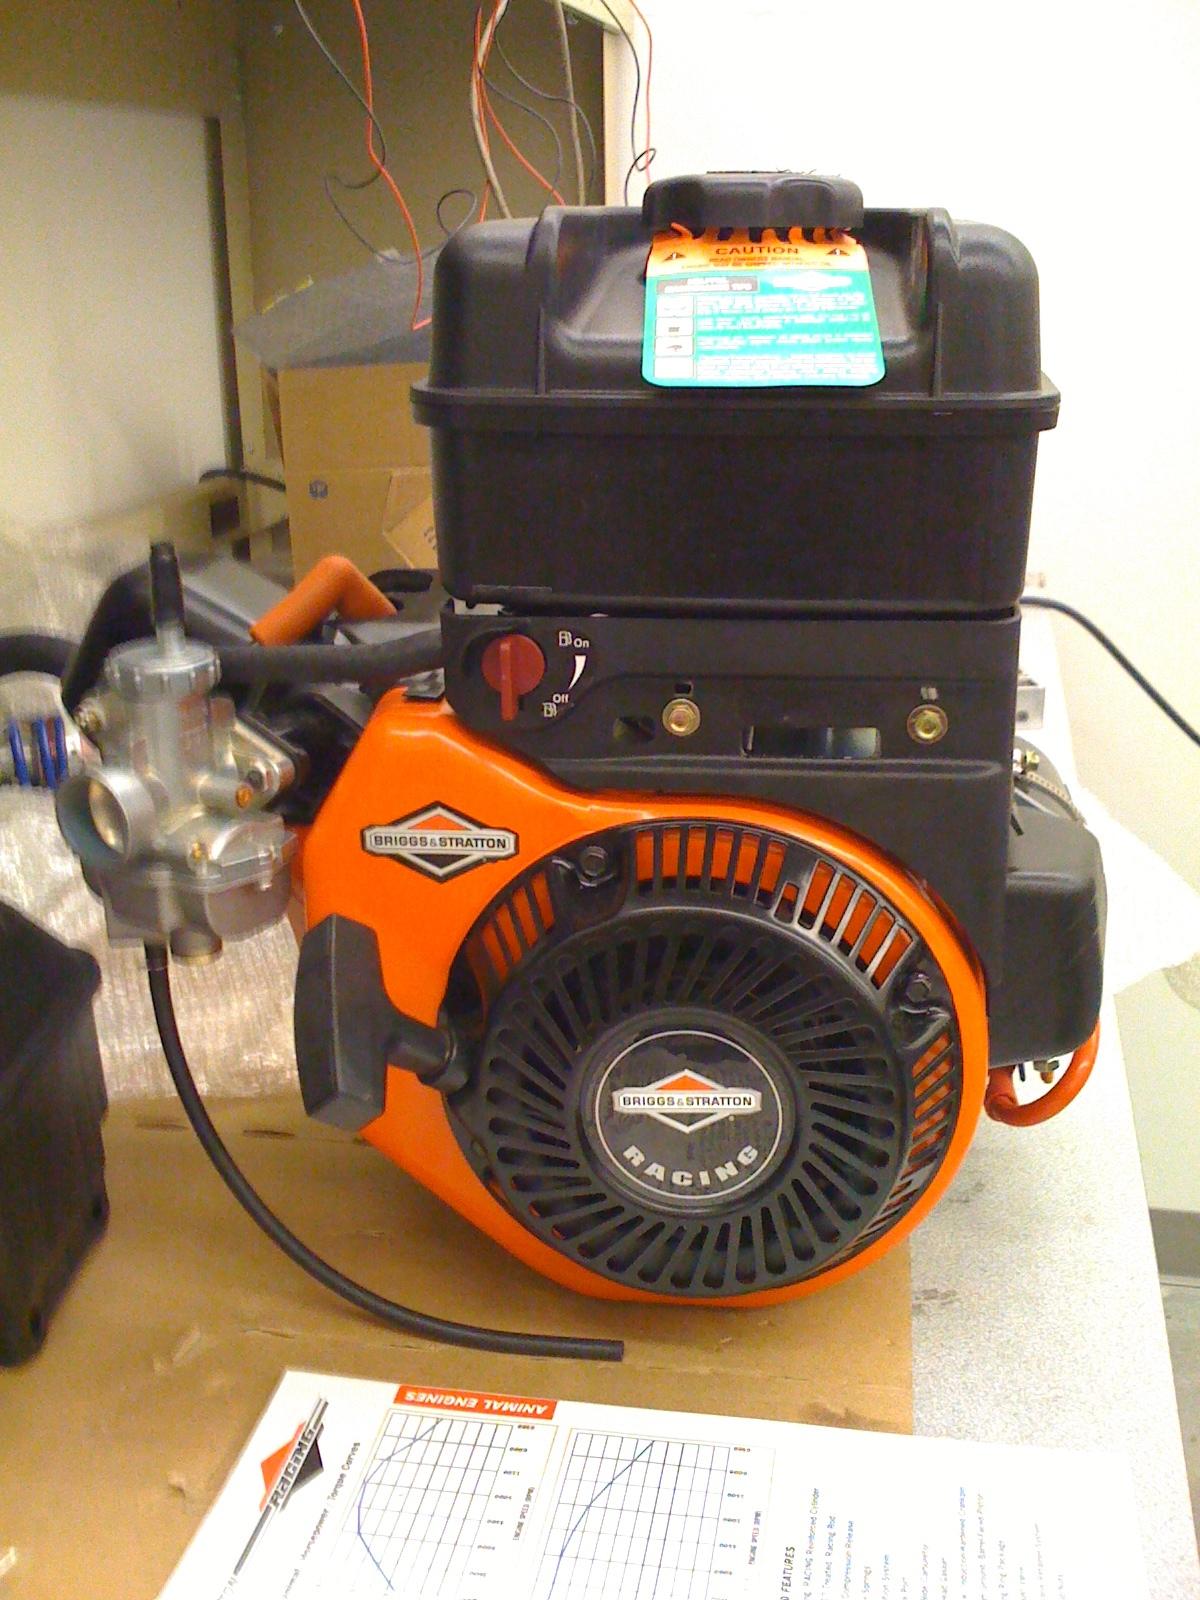 Briggs and Stratton, Animal 206cc racing engine (used as hybrid generator)